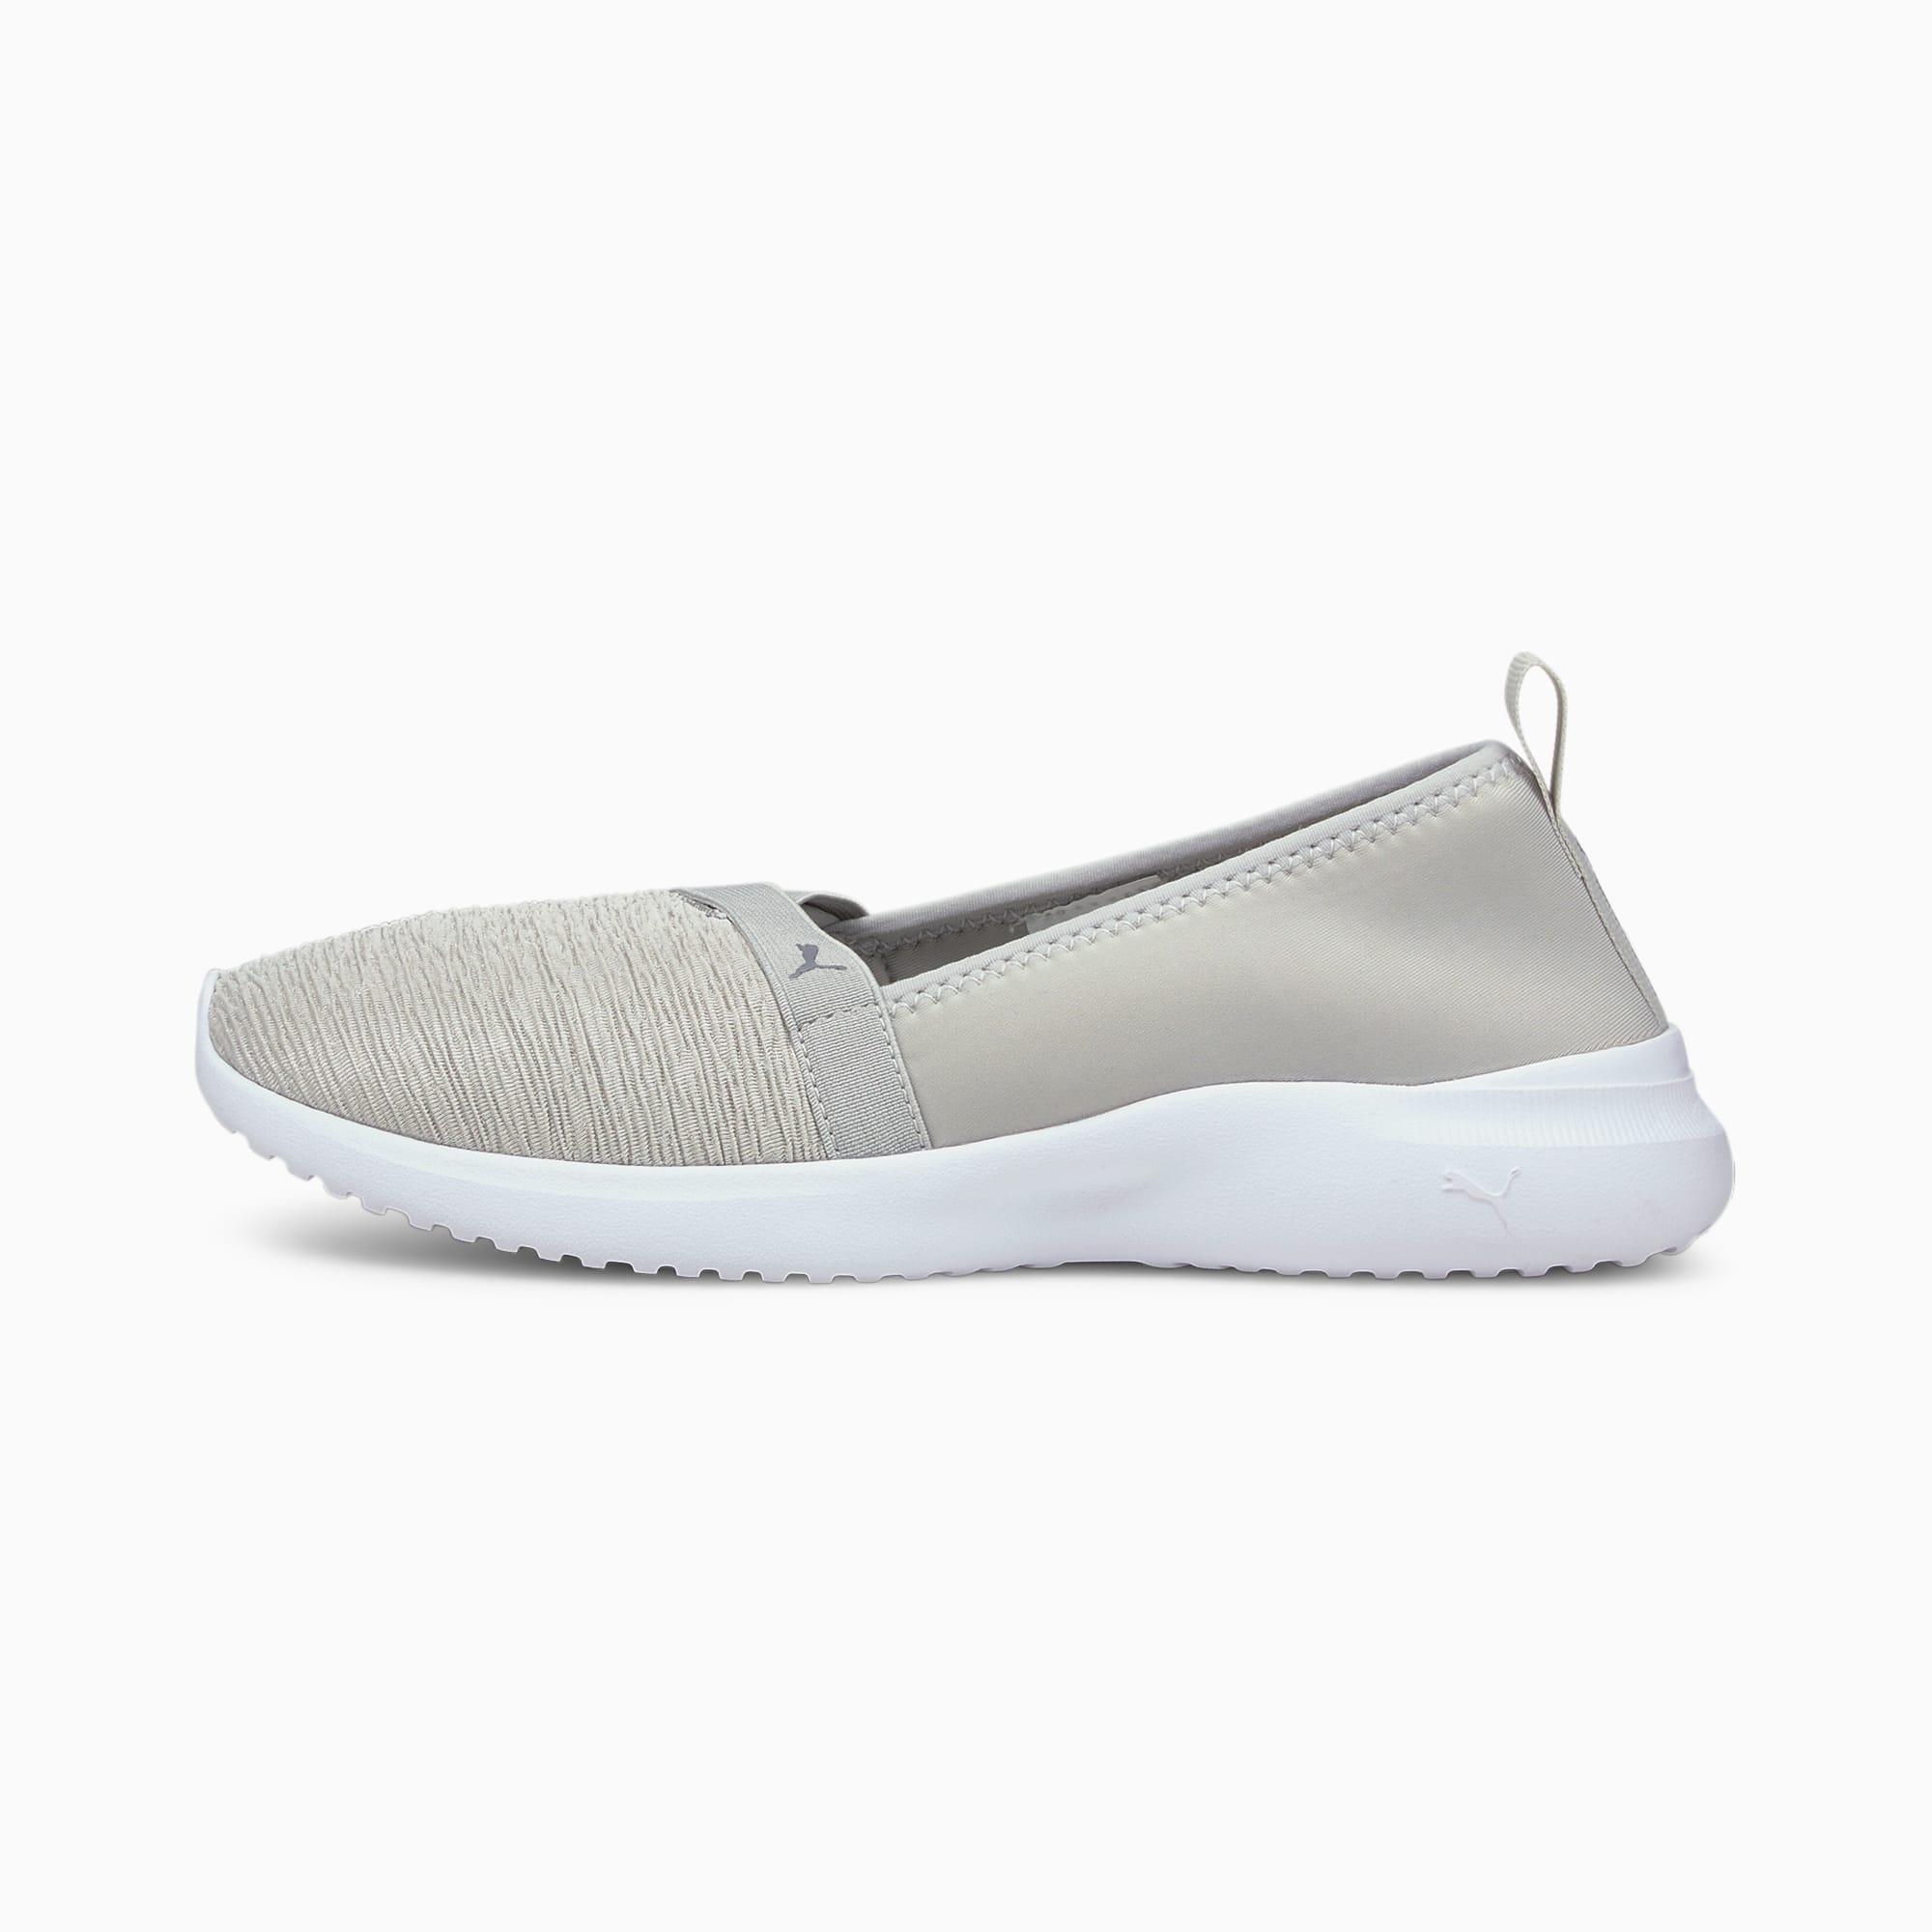 Chaussure Basket Adelina Slip-On, Gris, Taille 38.5, Chaussures - PUMA - Modalova